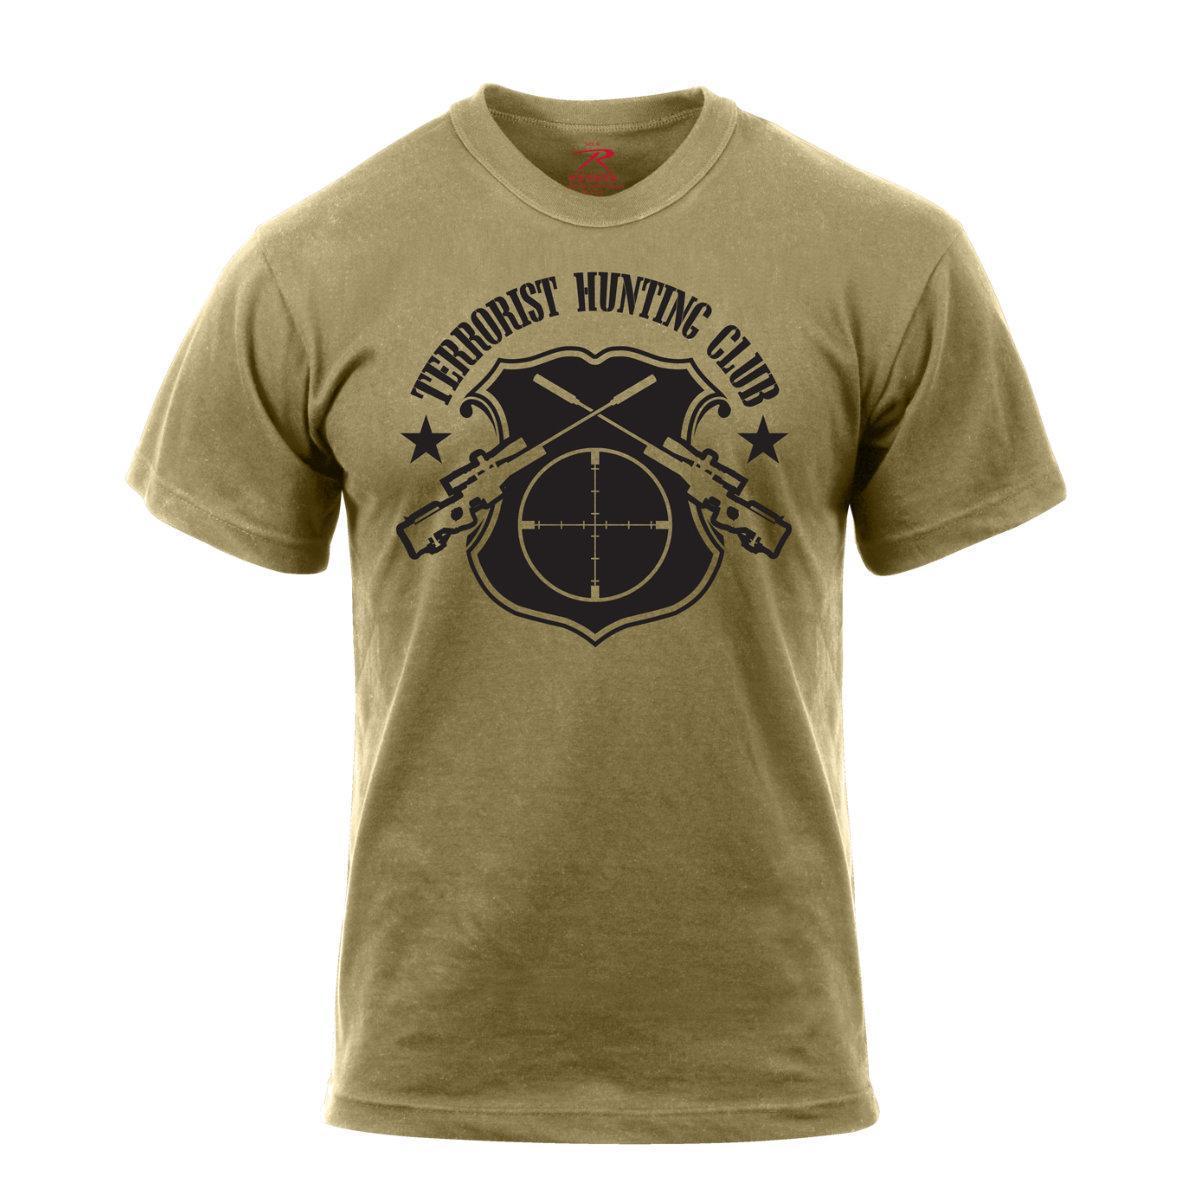 2019 Fashion Summer Style Rothco 'Terrorist Hunts Club' T-Shirt, Coyote Brown Tee Shirt